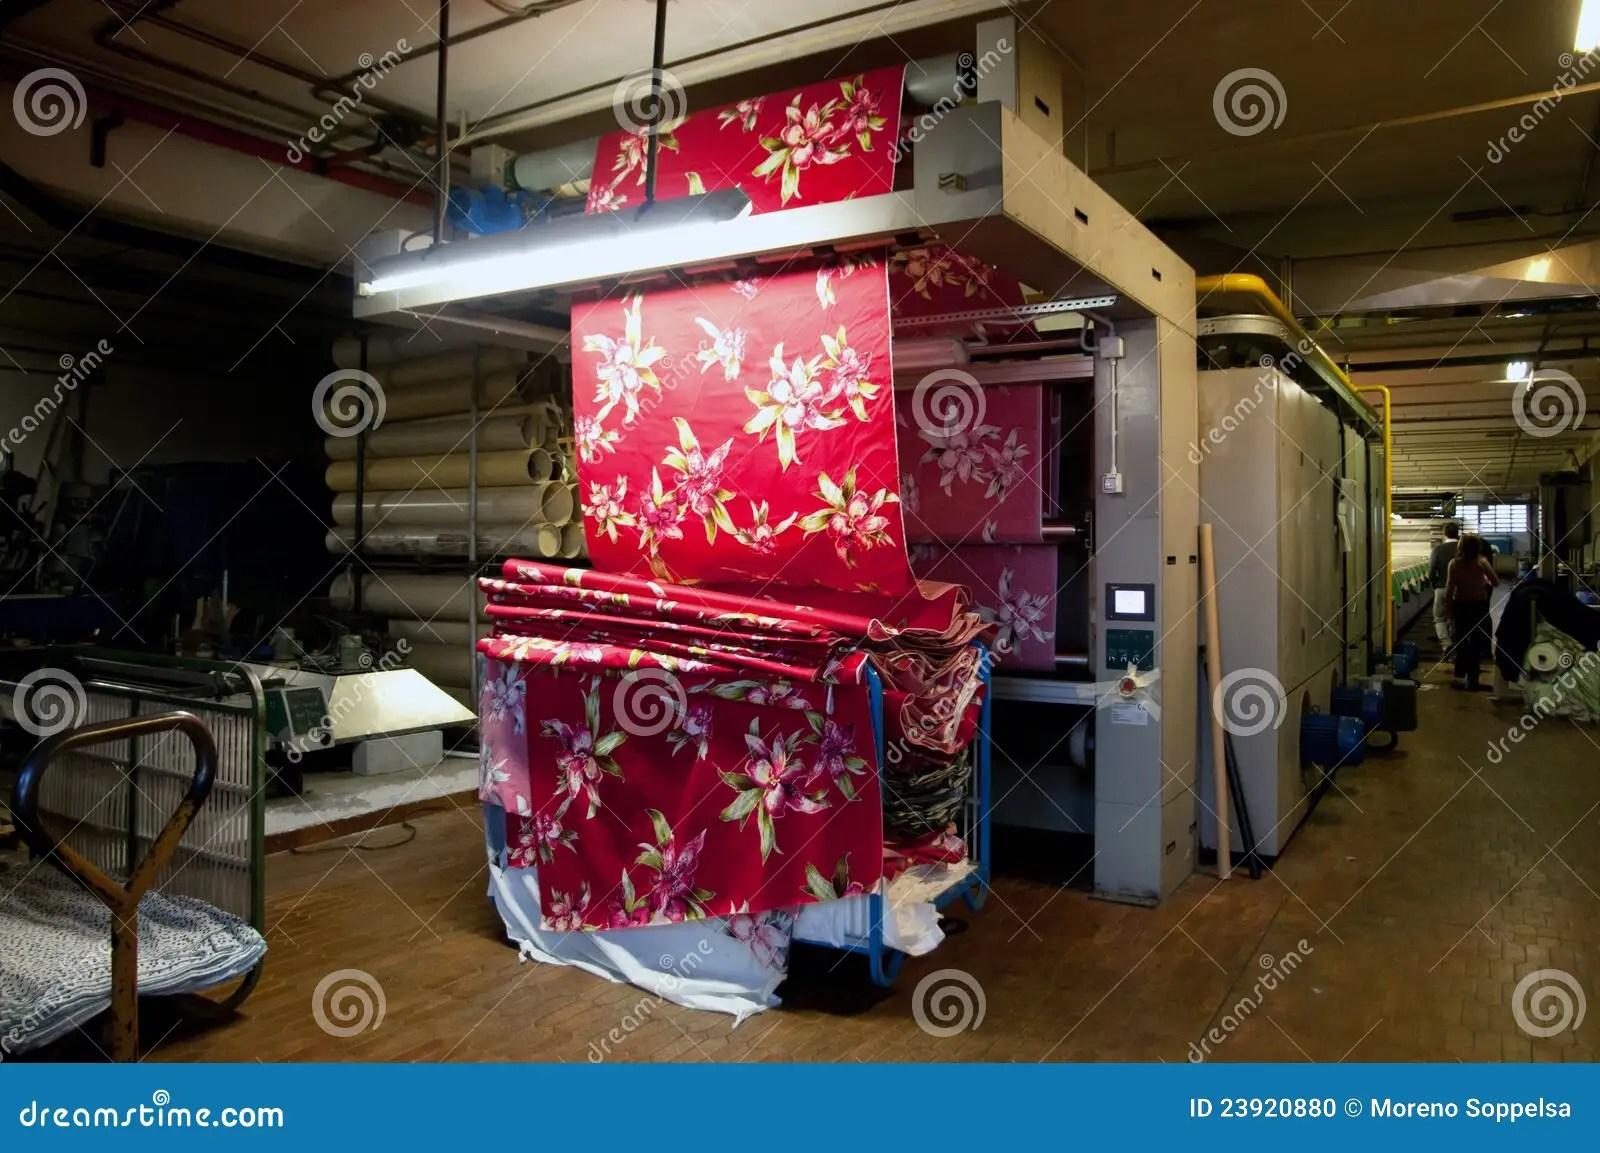 Roller Printing Textiles